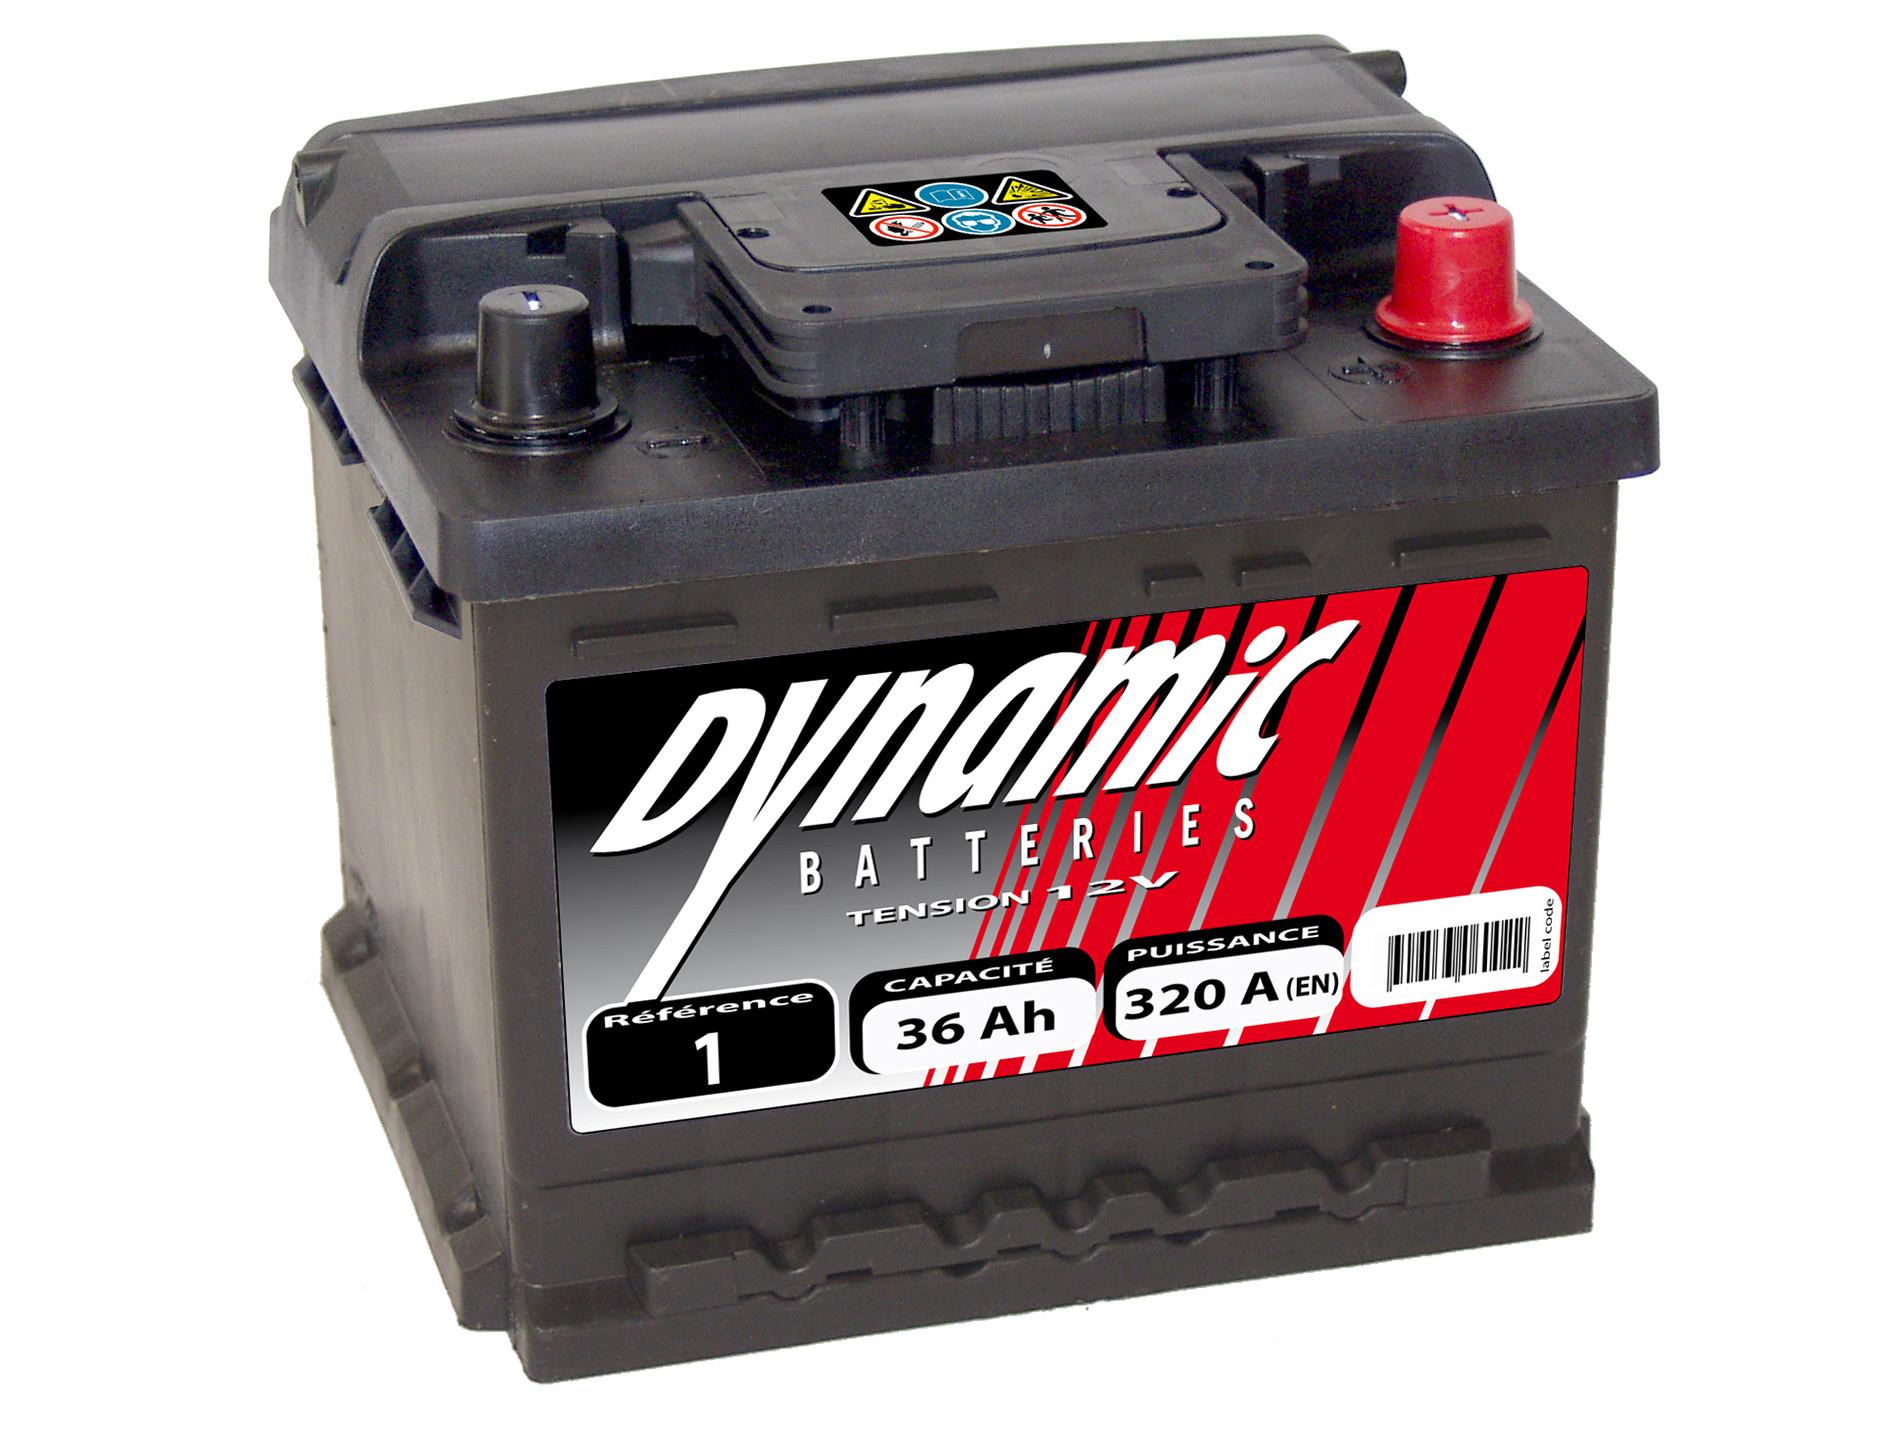 Batterie 12V N°5 Sélection Emeraude 41Ah 370A +D Batterie